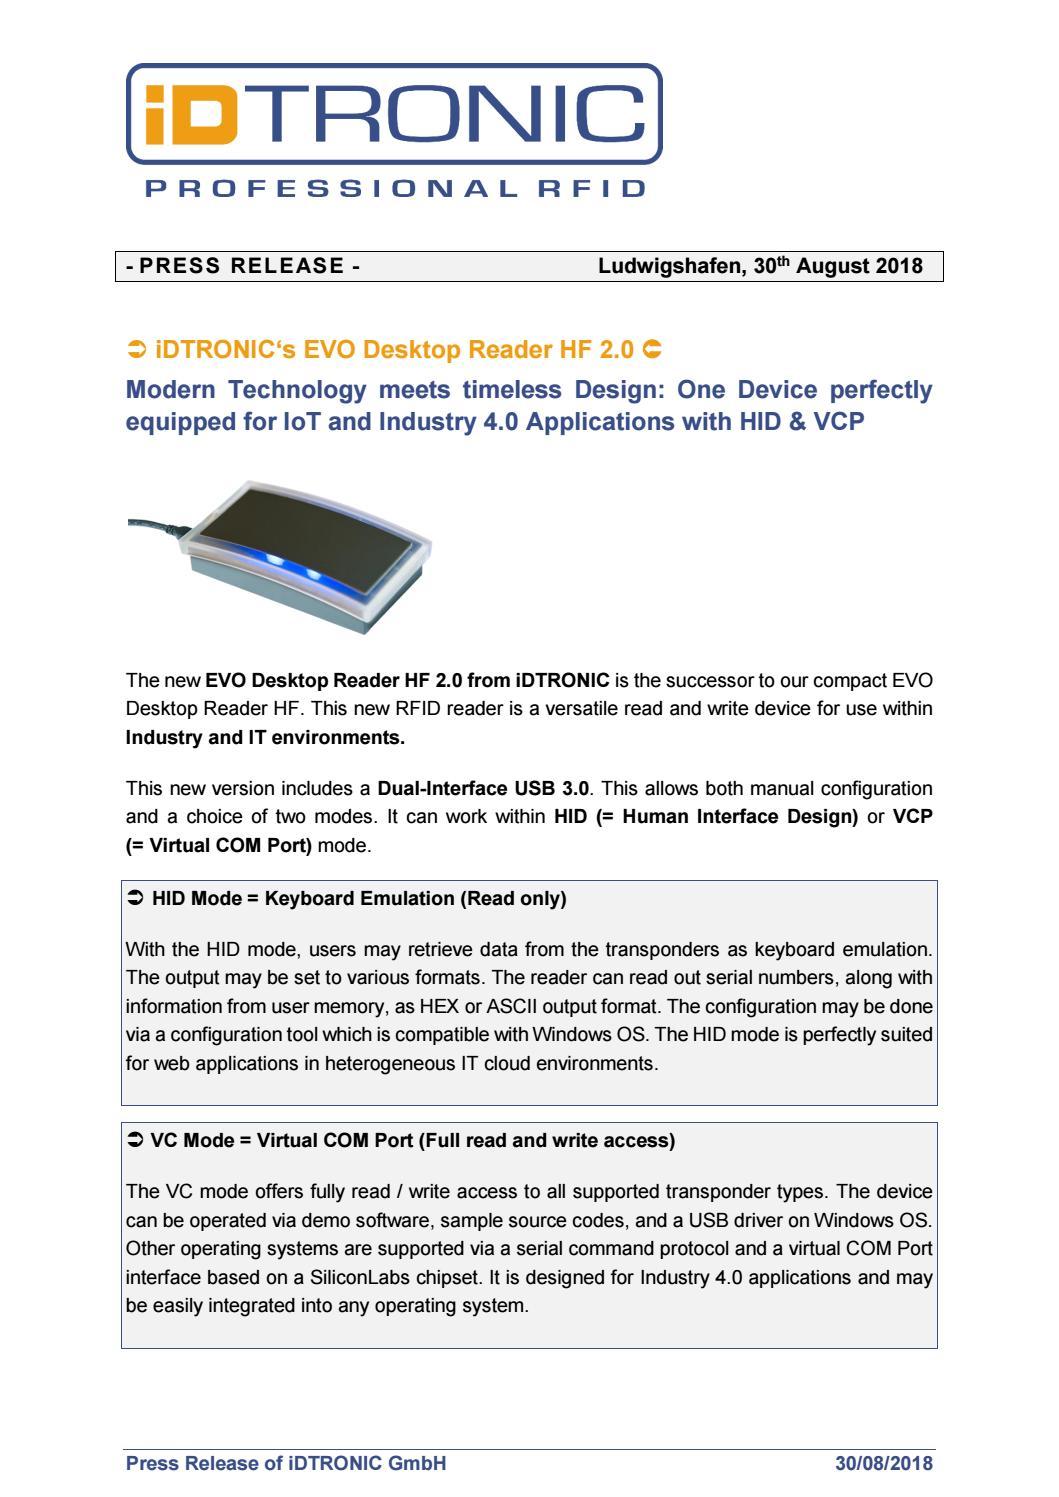 Press Release: iDTRONIC's EVO Desktop Reader HF 2 0 - Modern